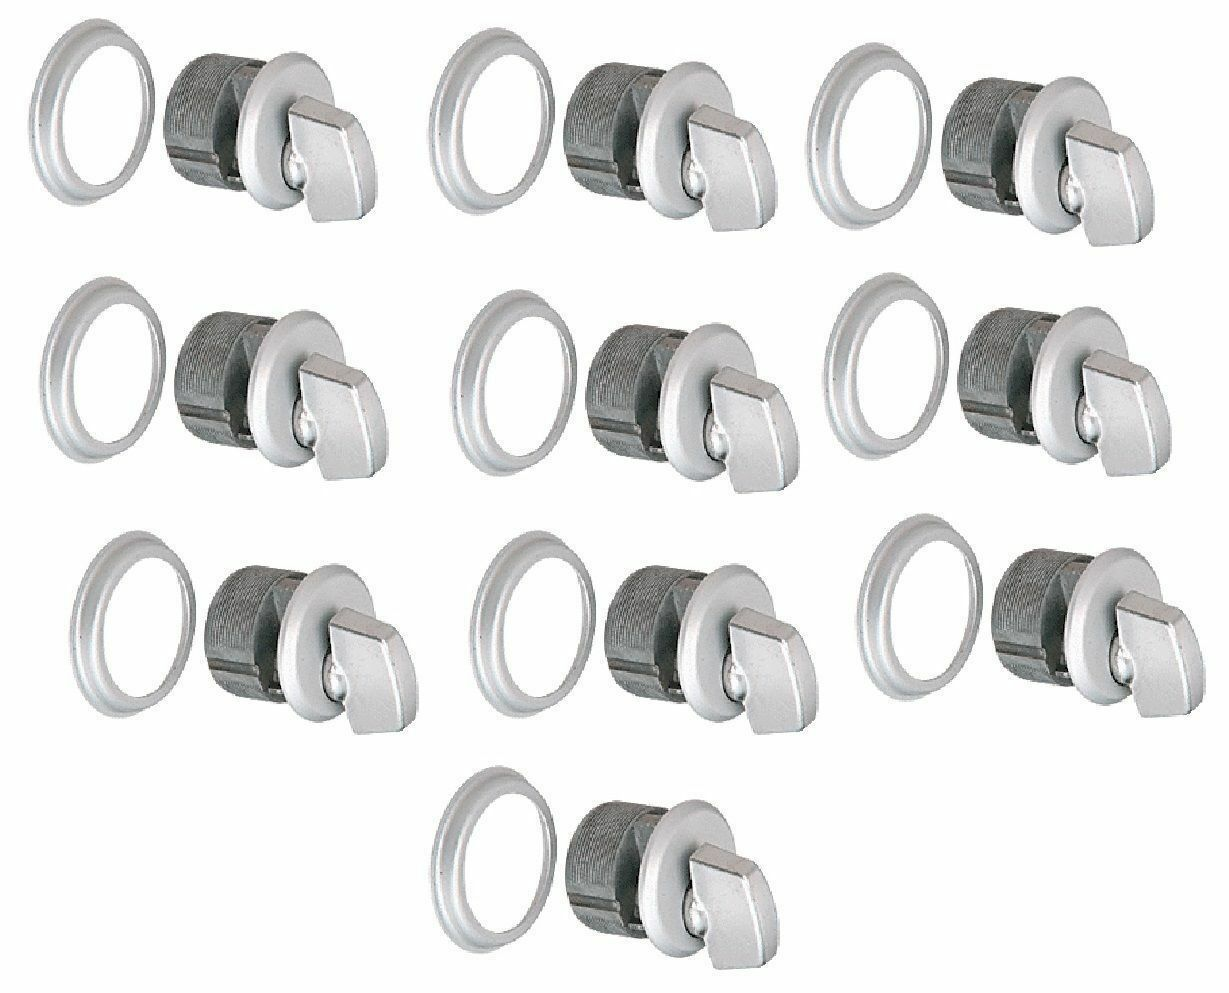 10 ilco thumbturn mortise cylinders 4 adams rite storefront locks